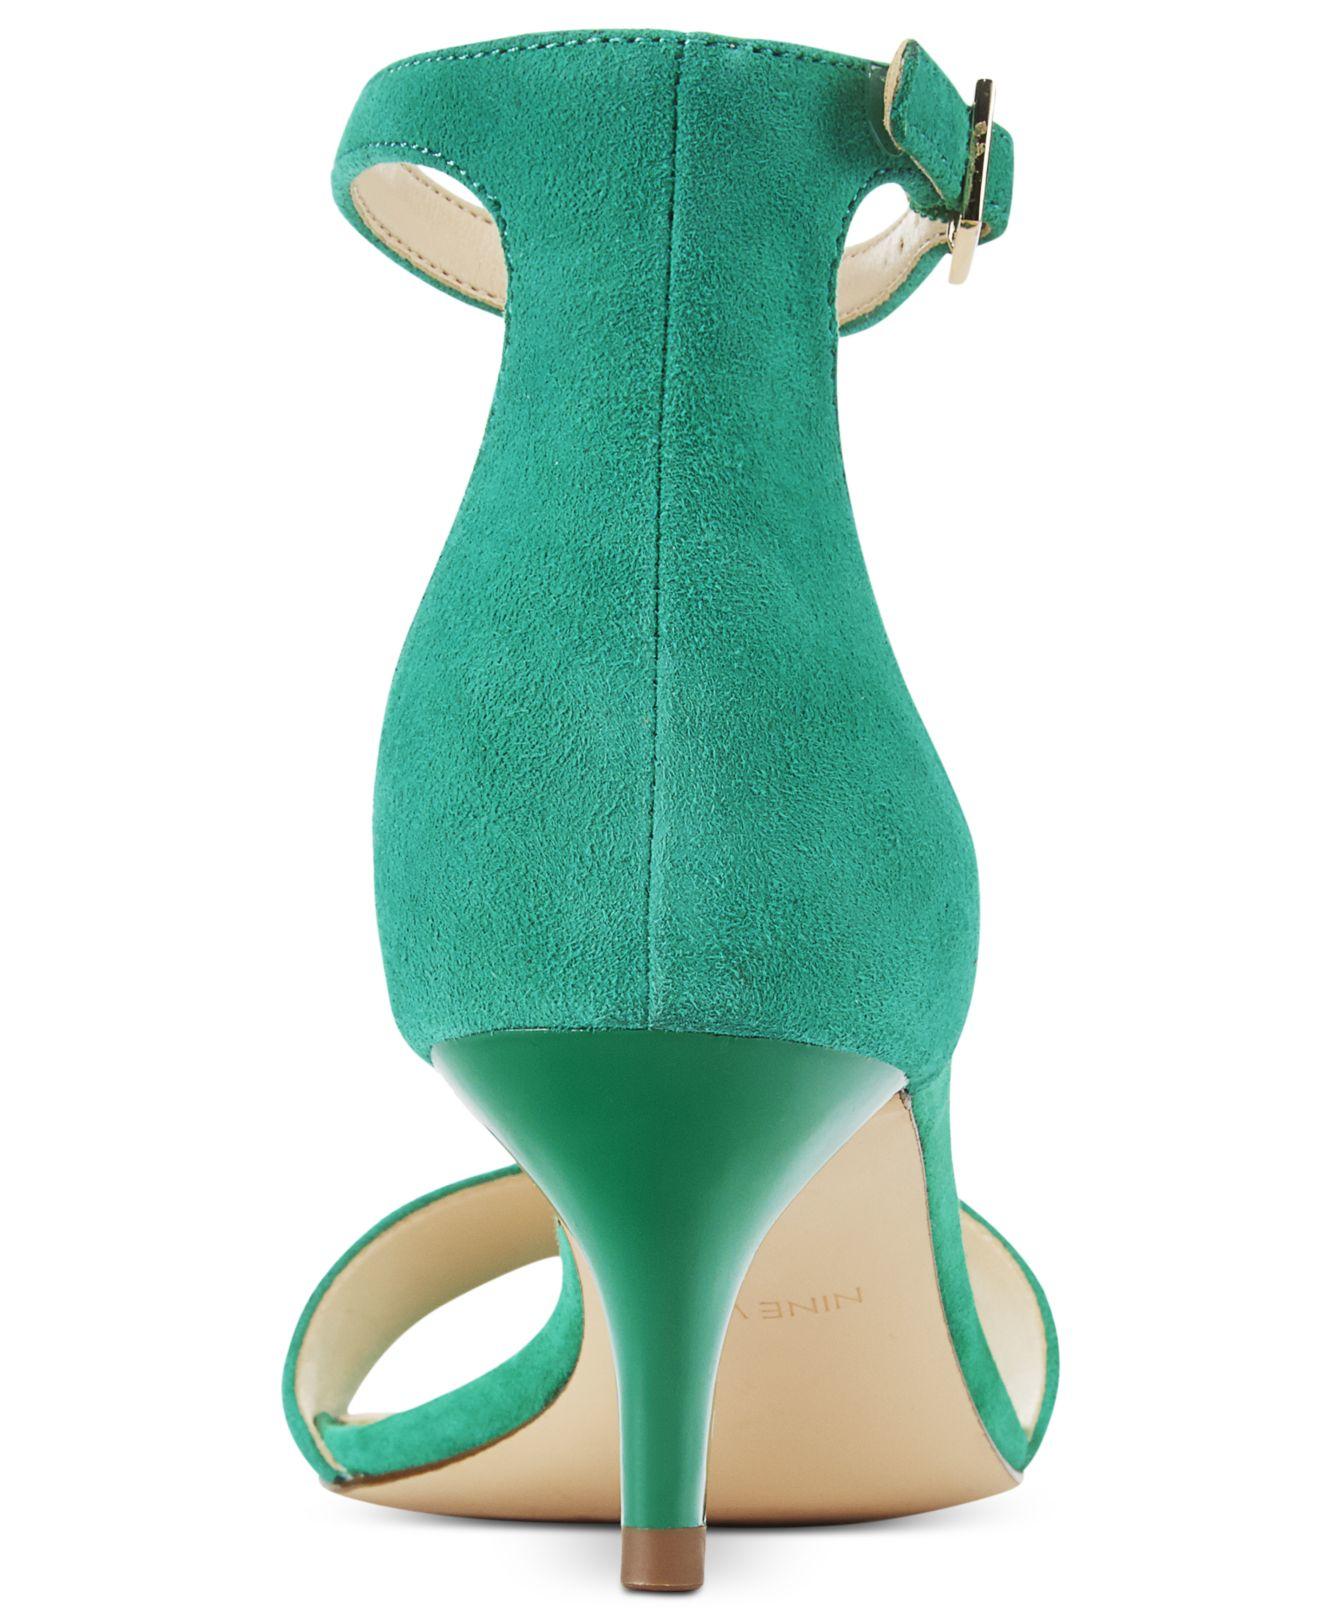 Debenhams Womens Shoes Green